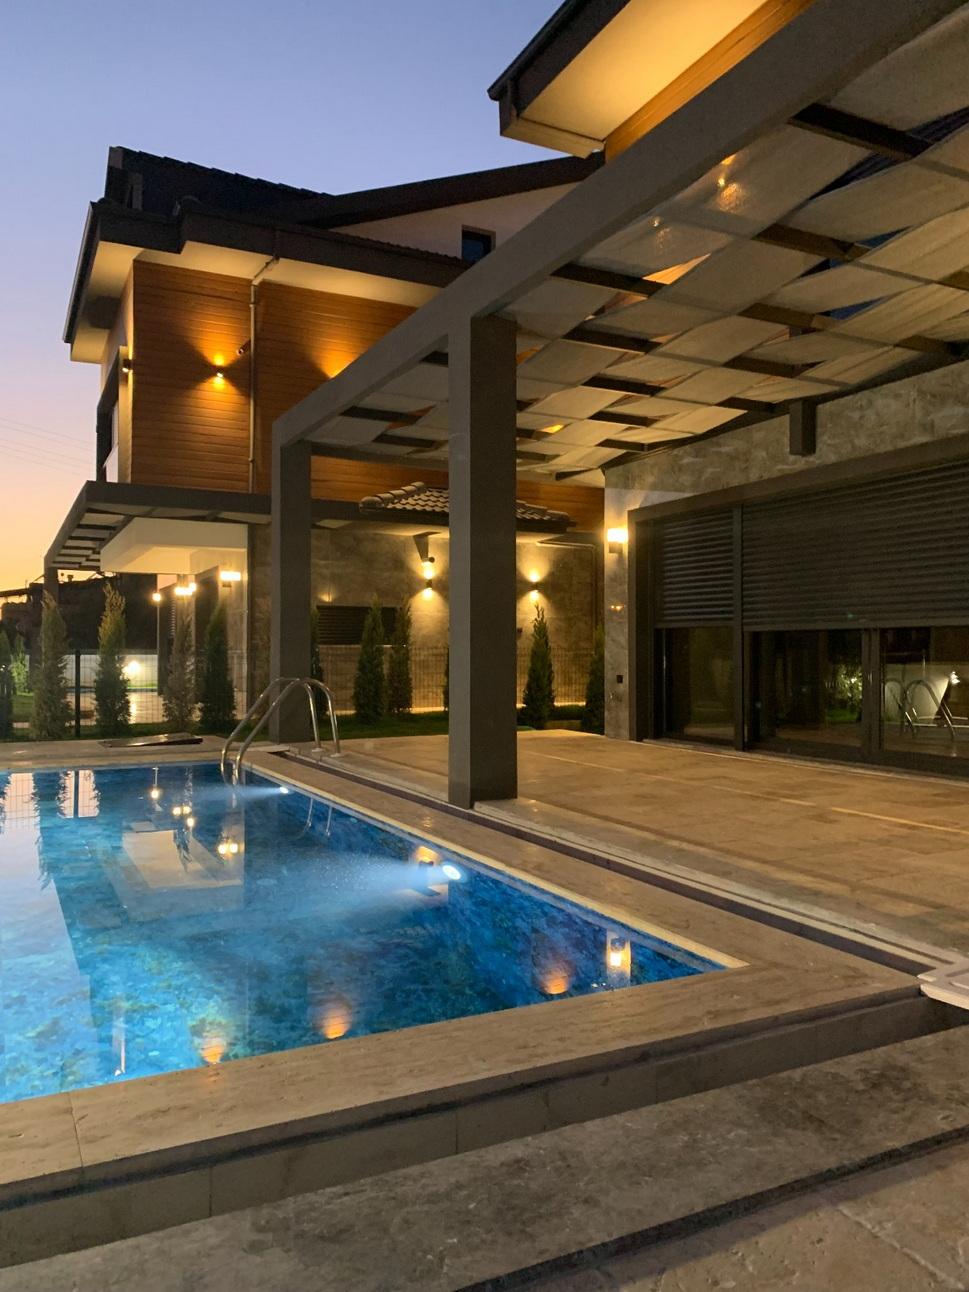 Brand New Luxury 4 Bedroom Detached Villa in Fethiye